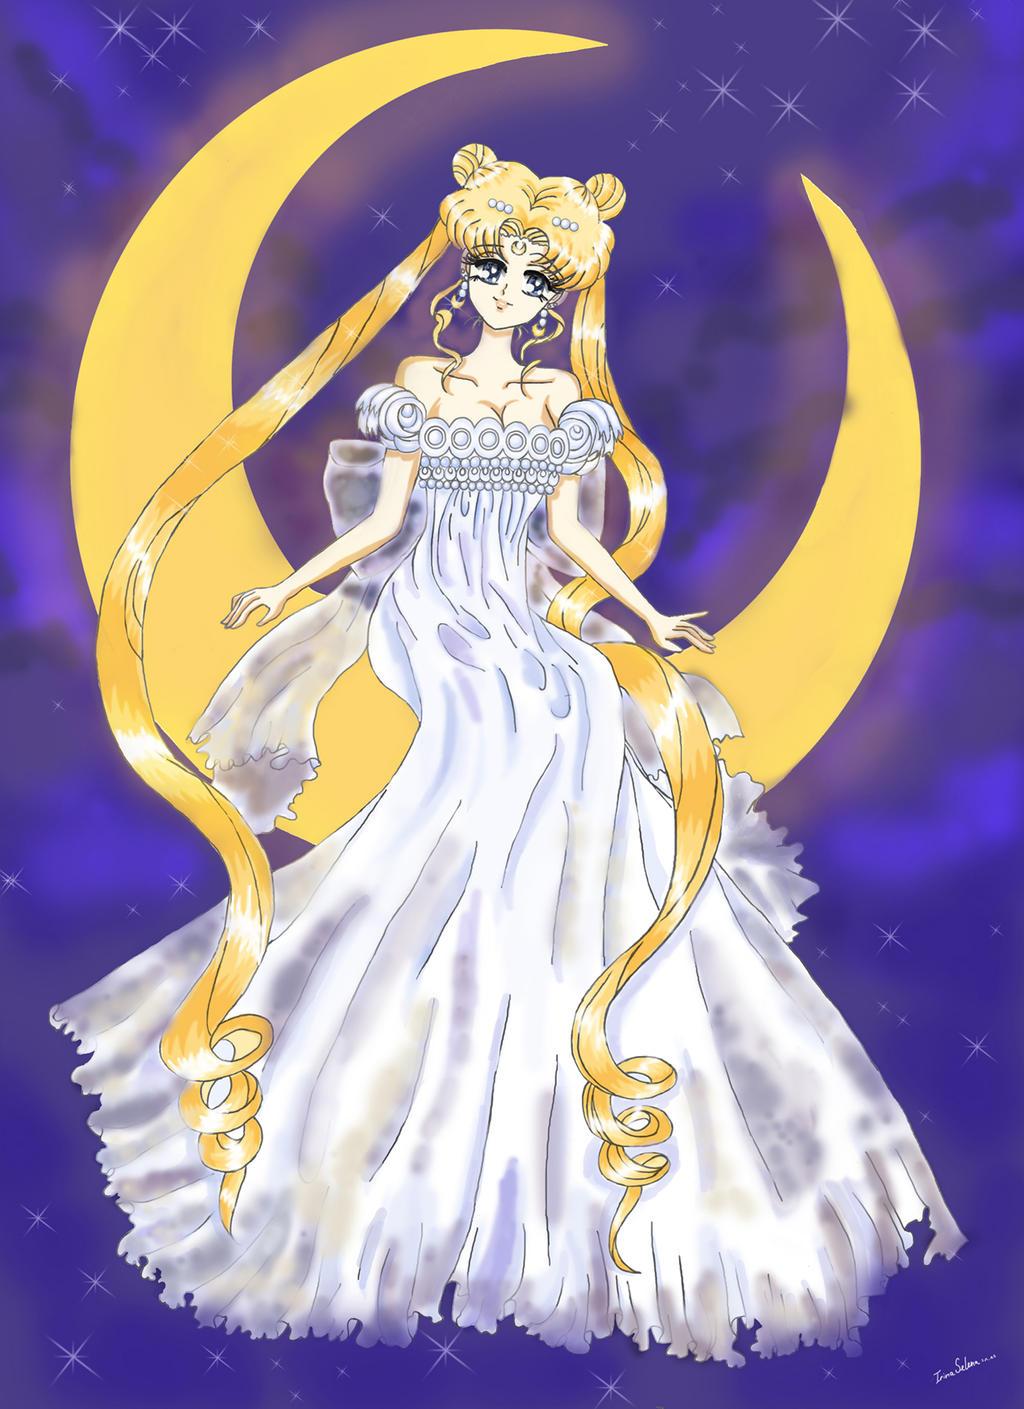 sailor moon princess serenity by irinaselena on deviantart